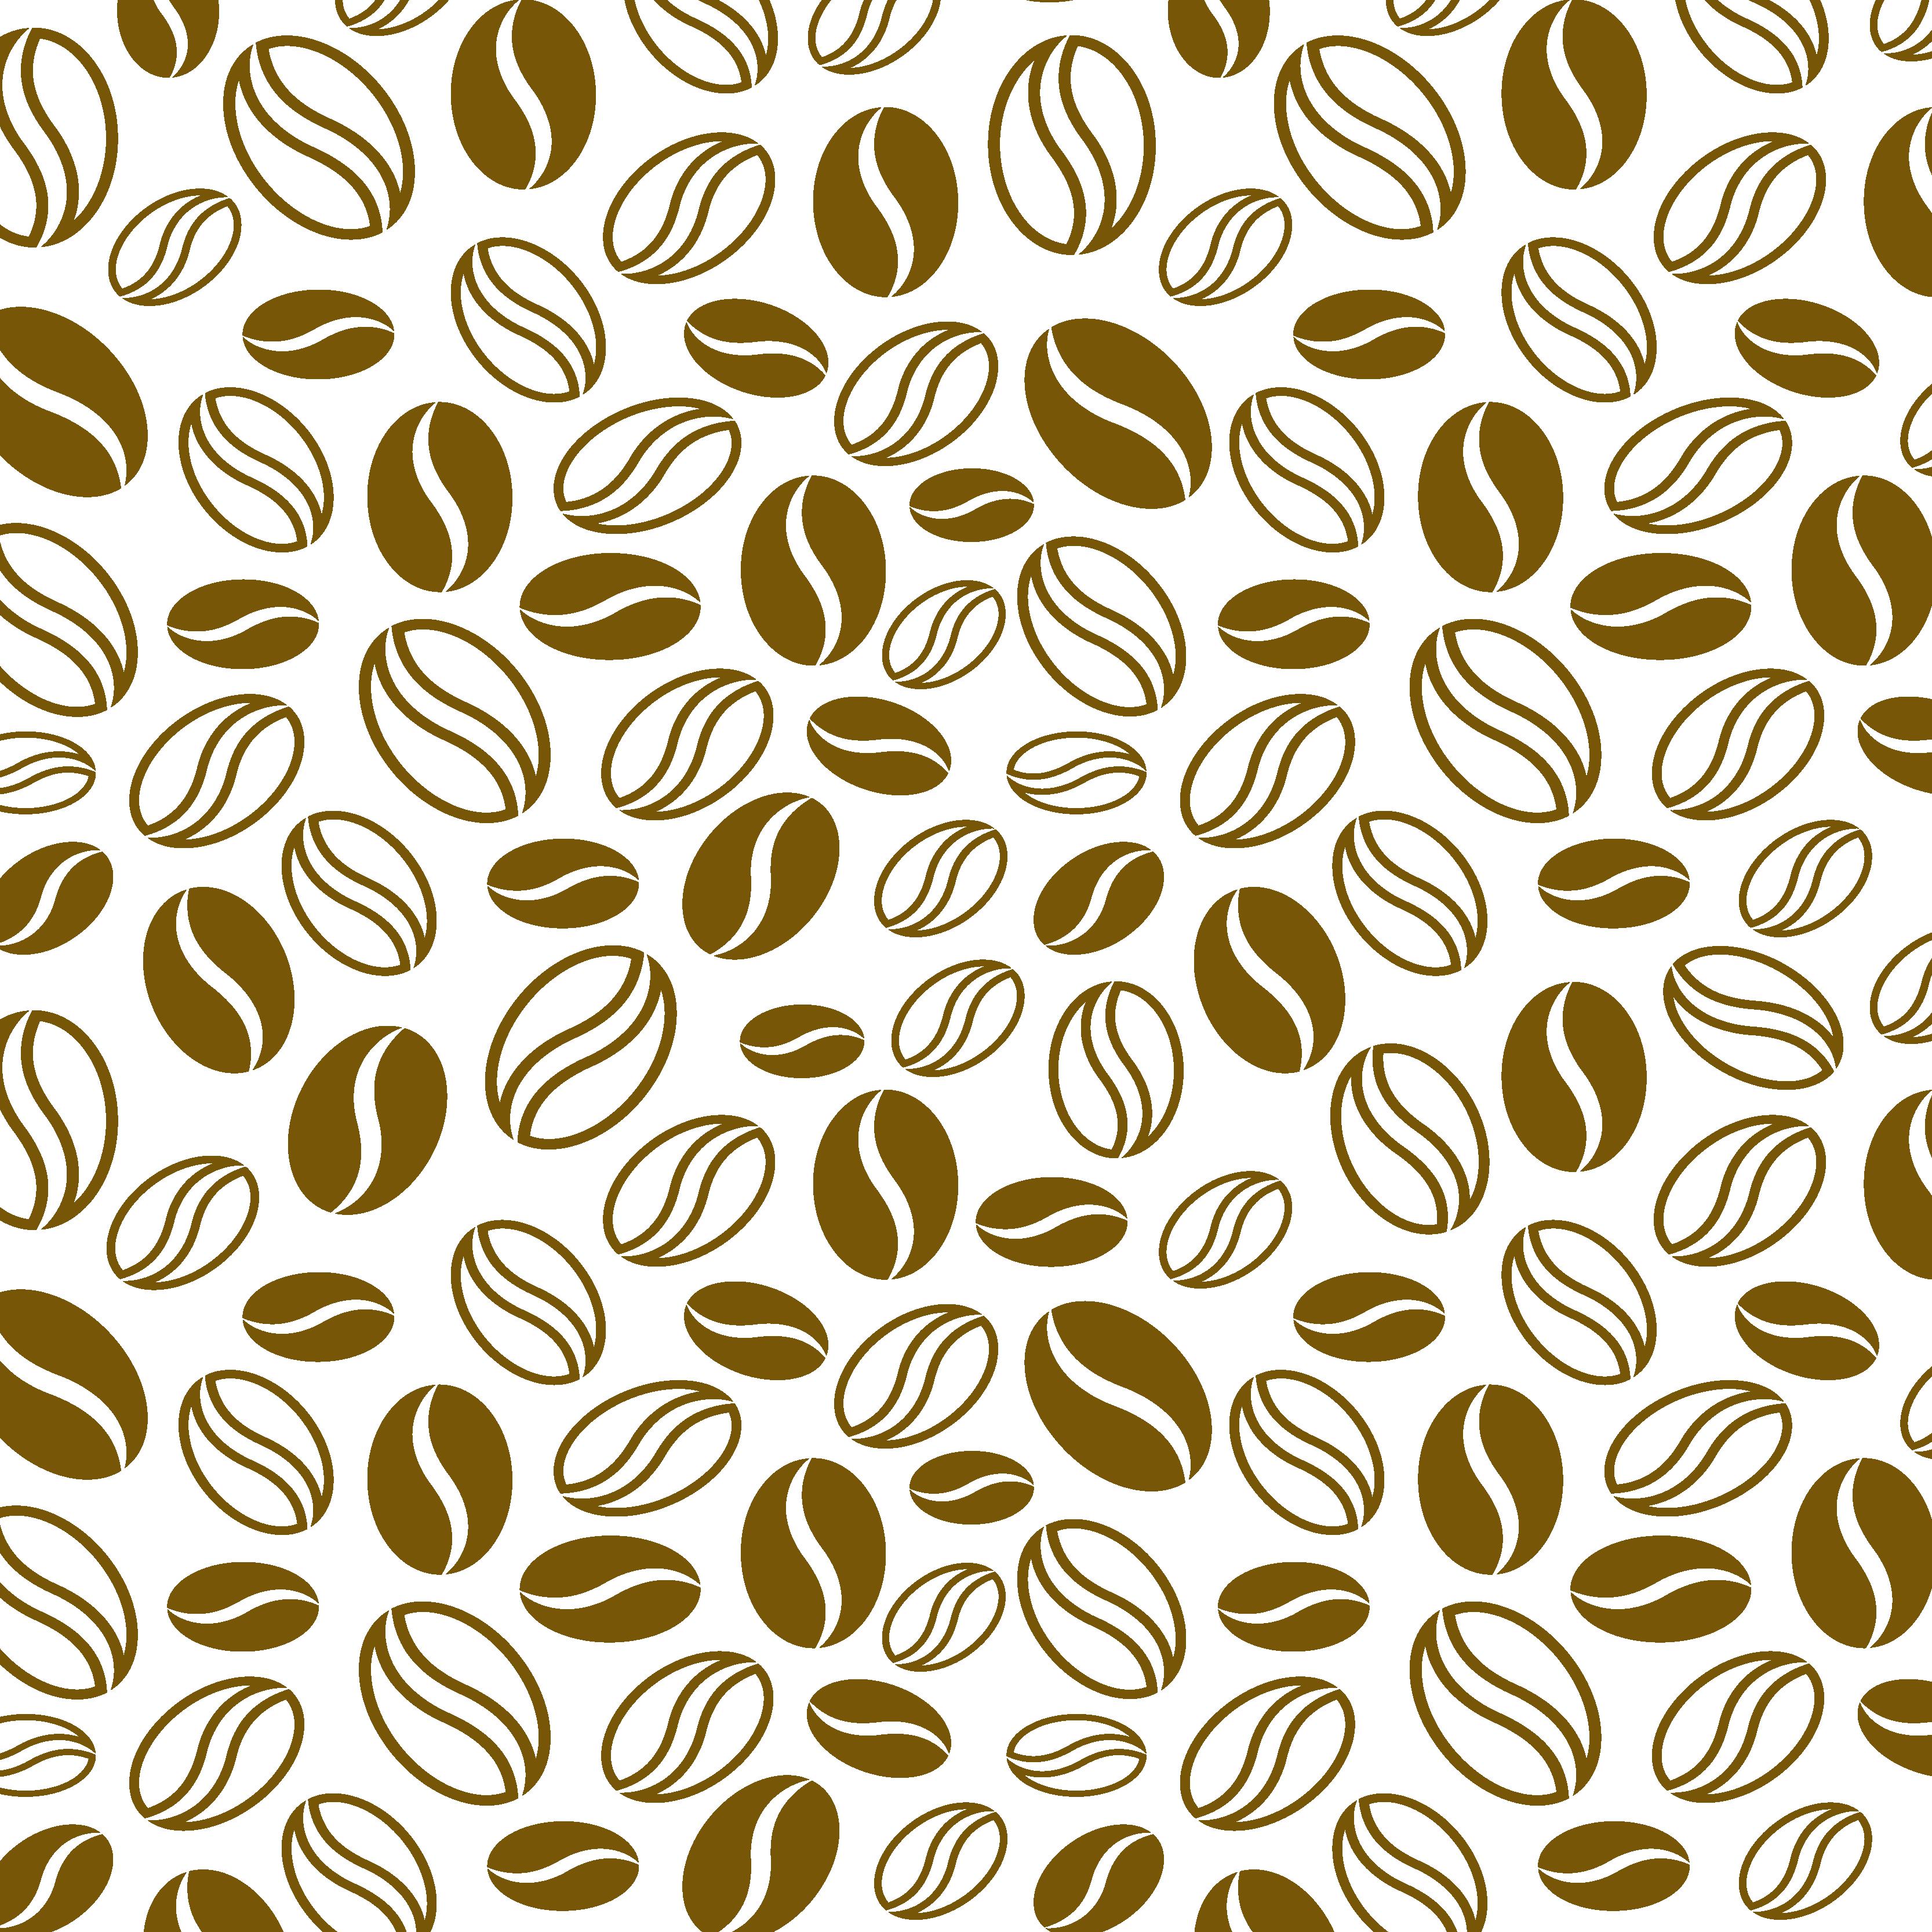 Coffee Bean Vector at GetDrawings | Free download